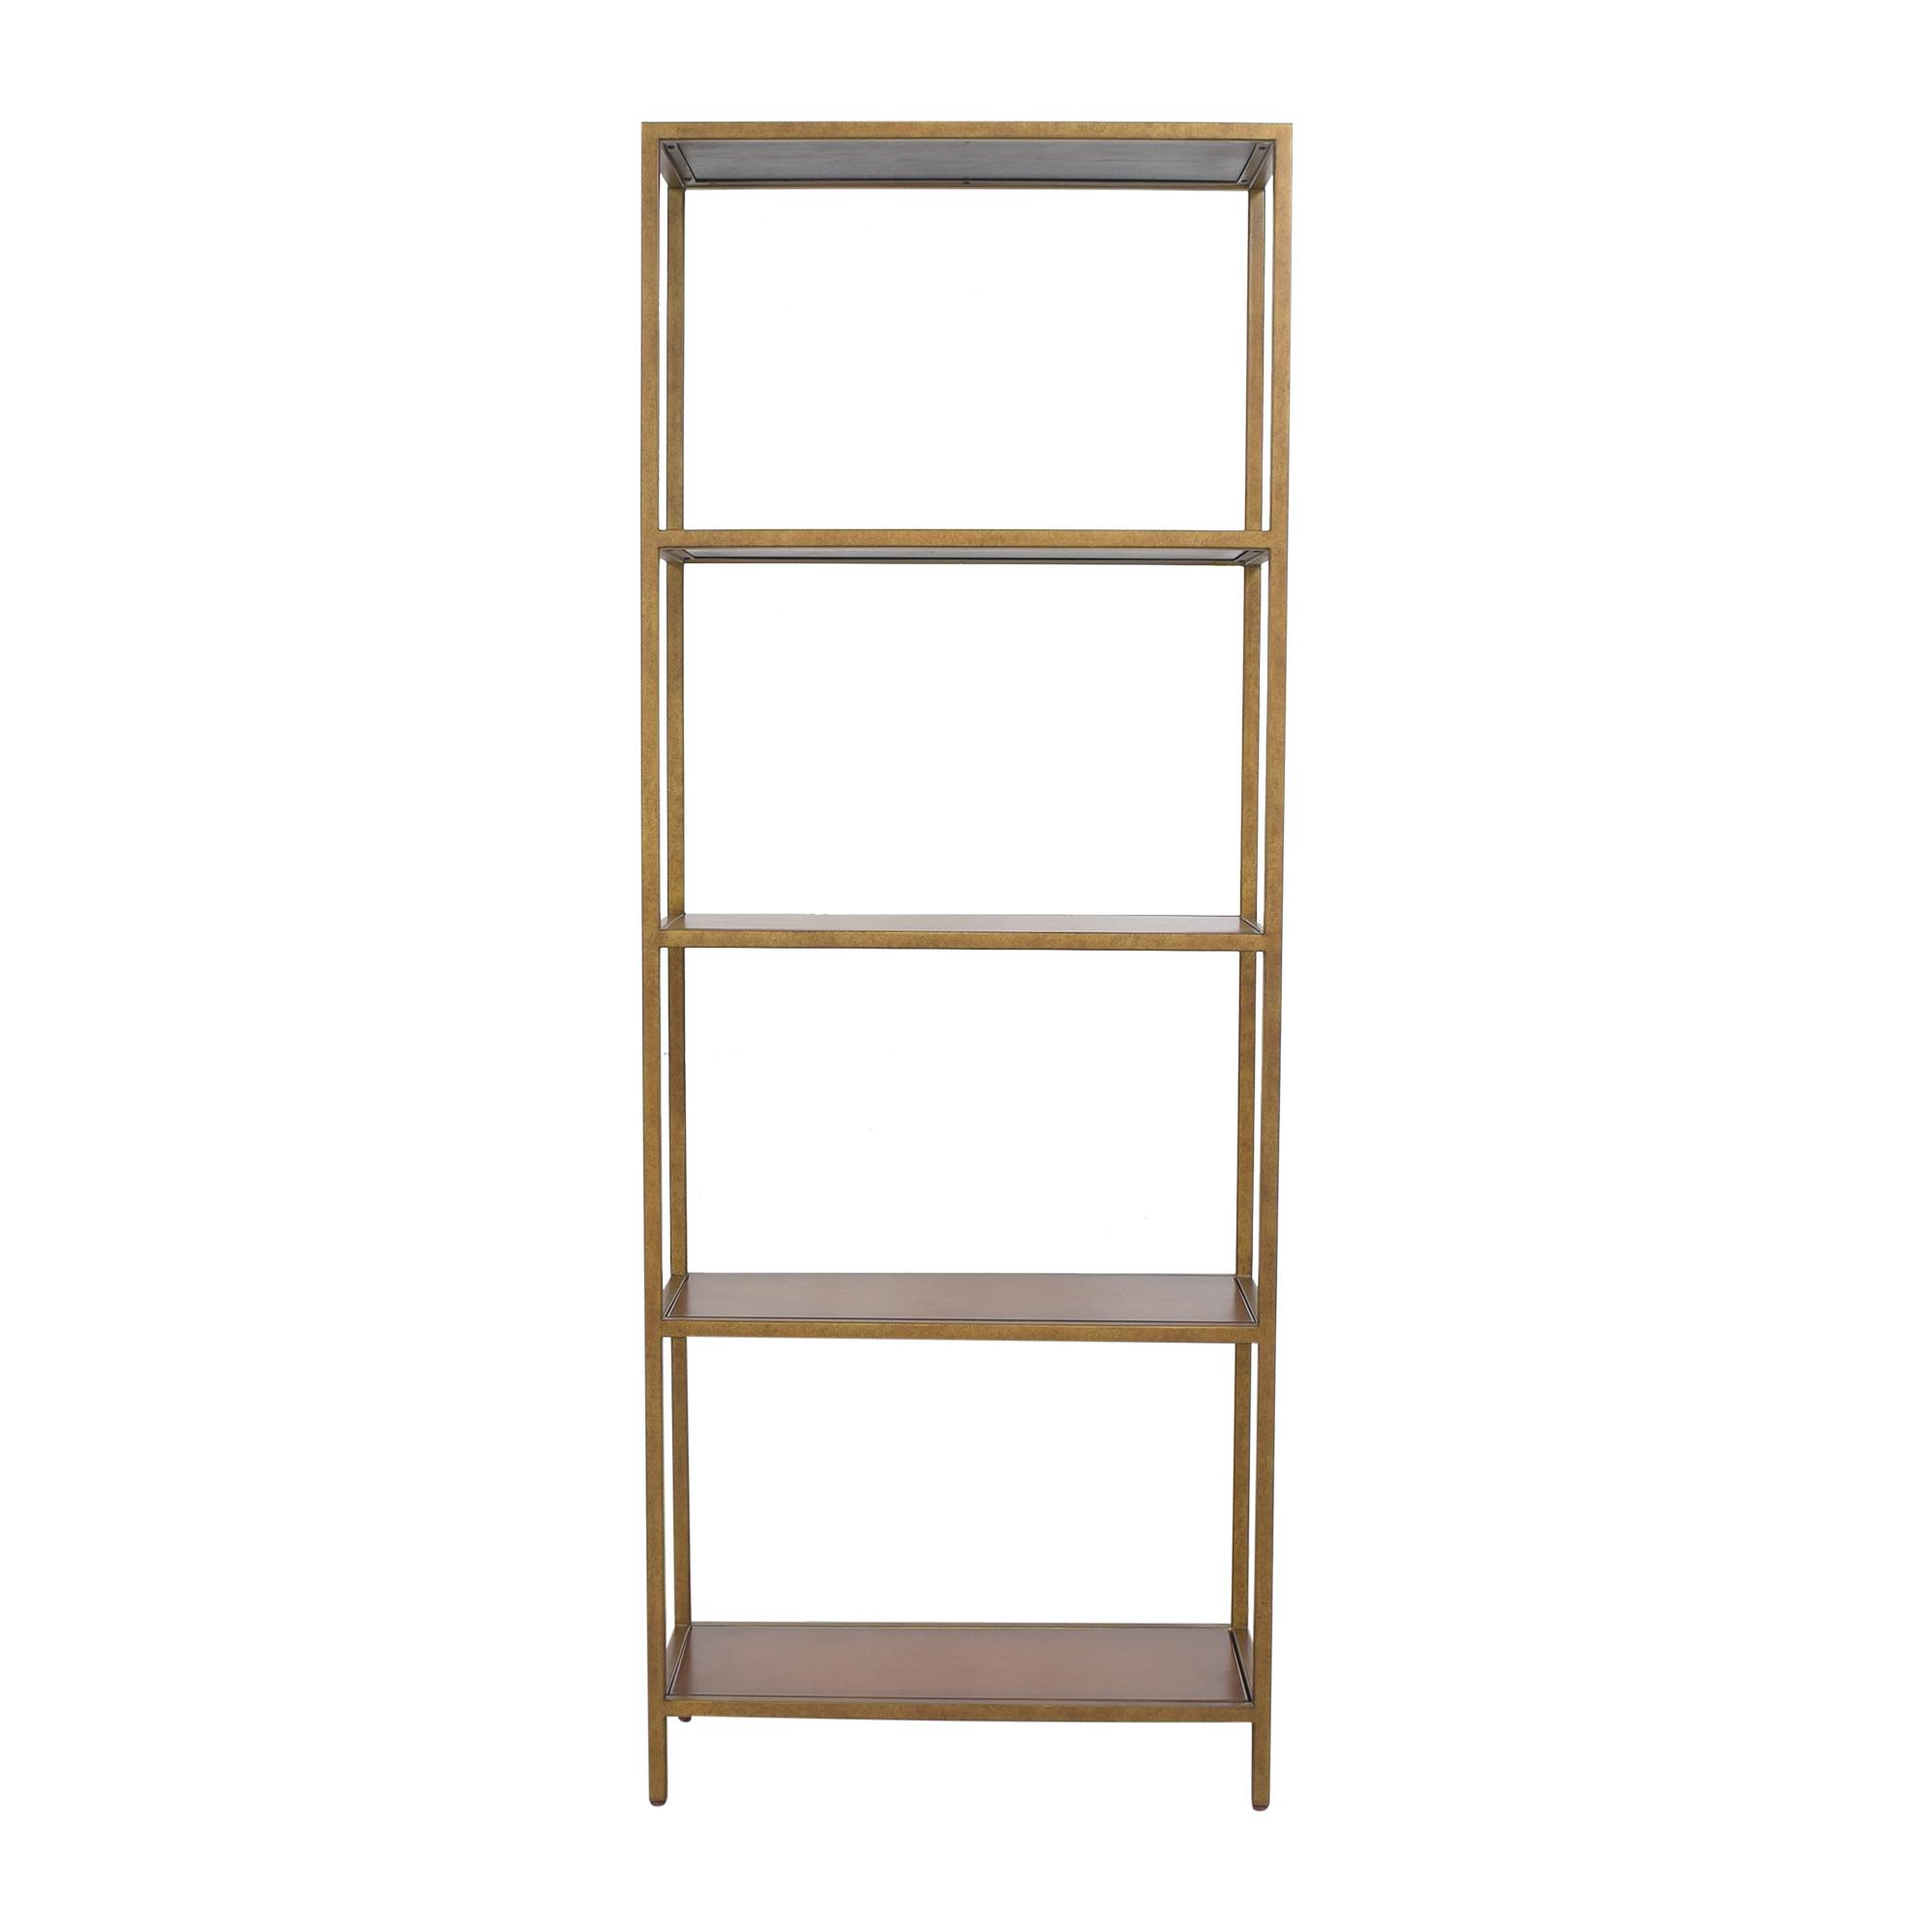 Julian Chichester University Bookshelf / Storage